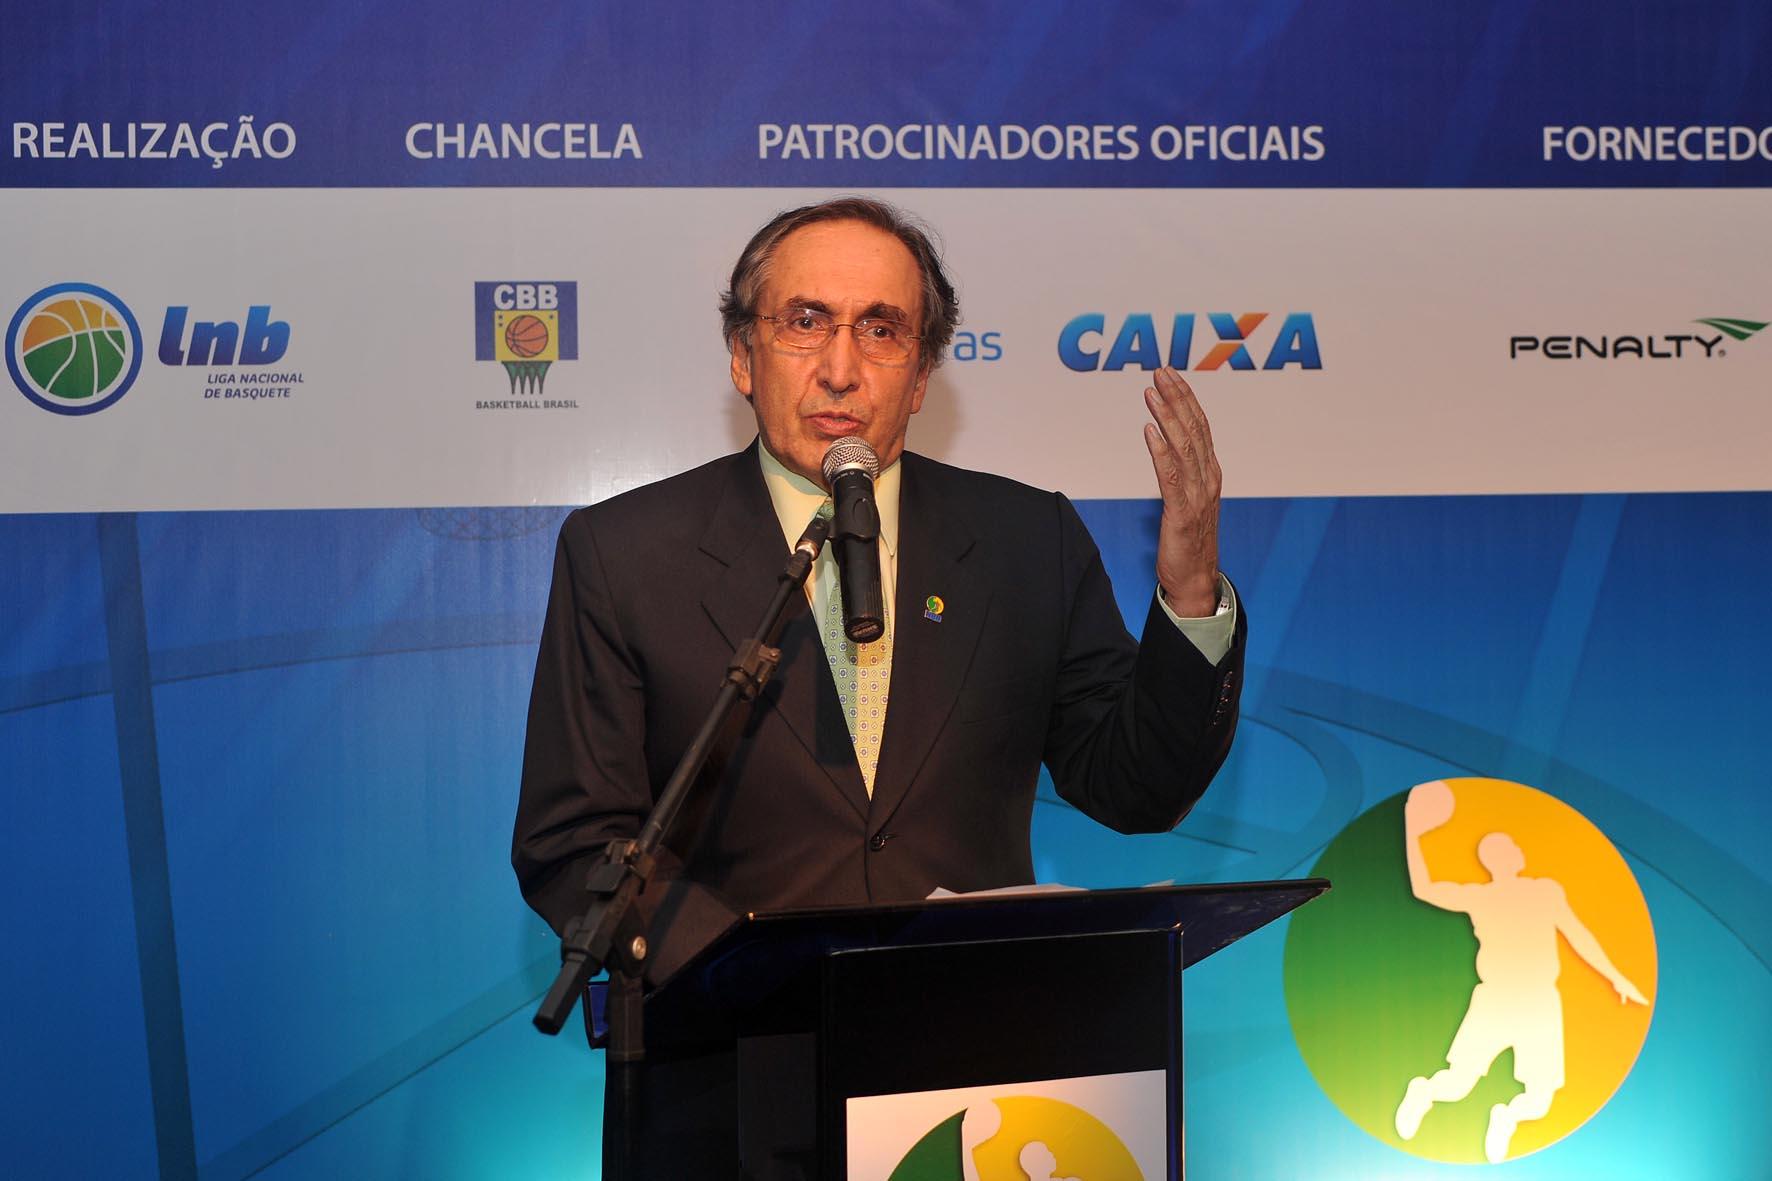 Kouros Monadjemi, presidente da LNB